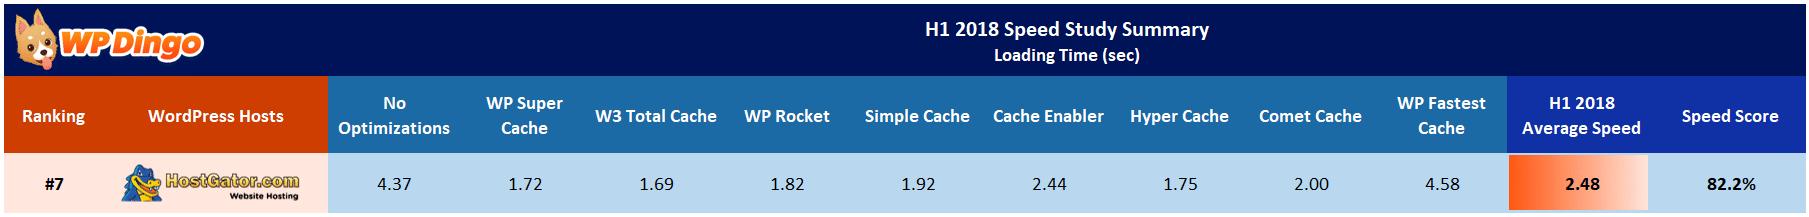 HostGator Speed Test Results Table - Jan 2018 to Jul 2018